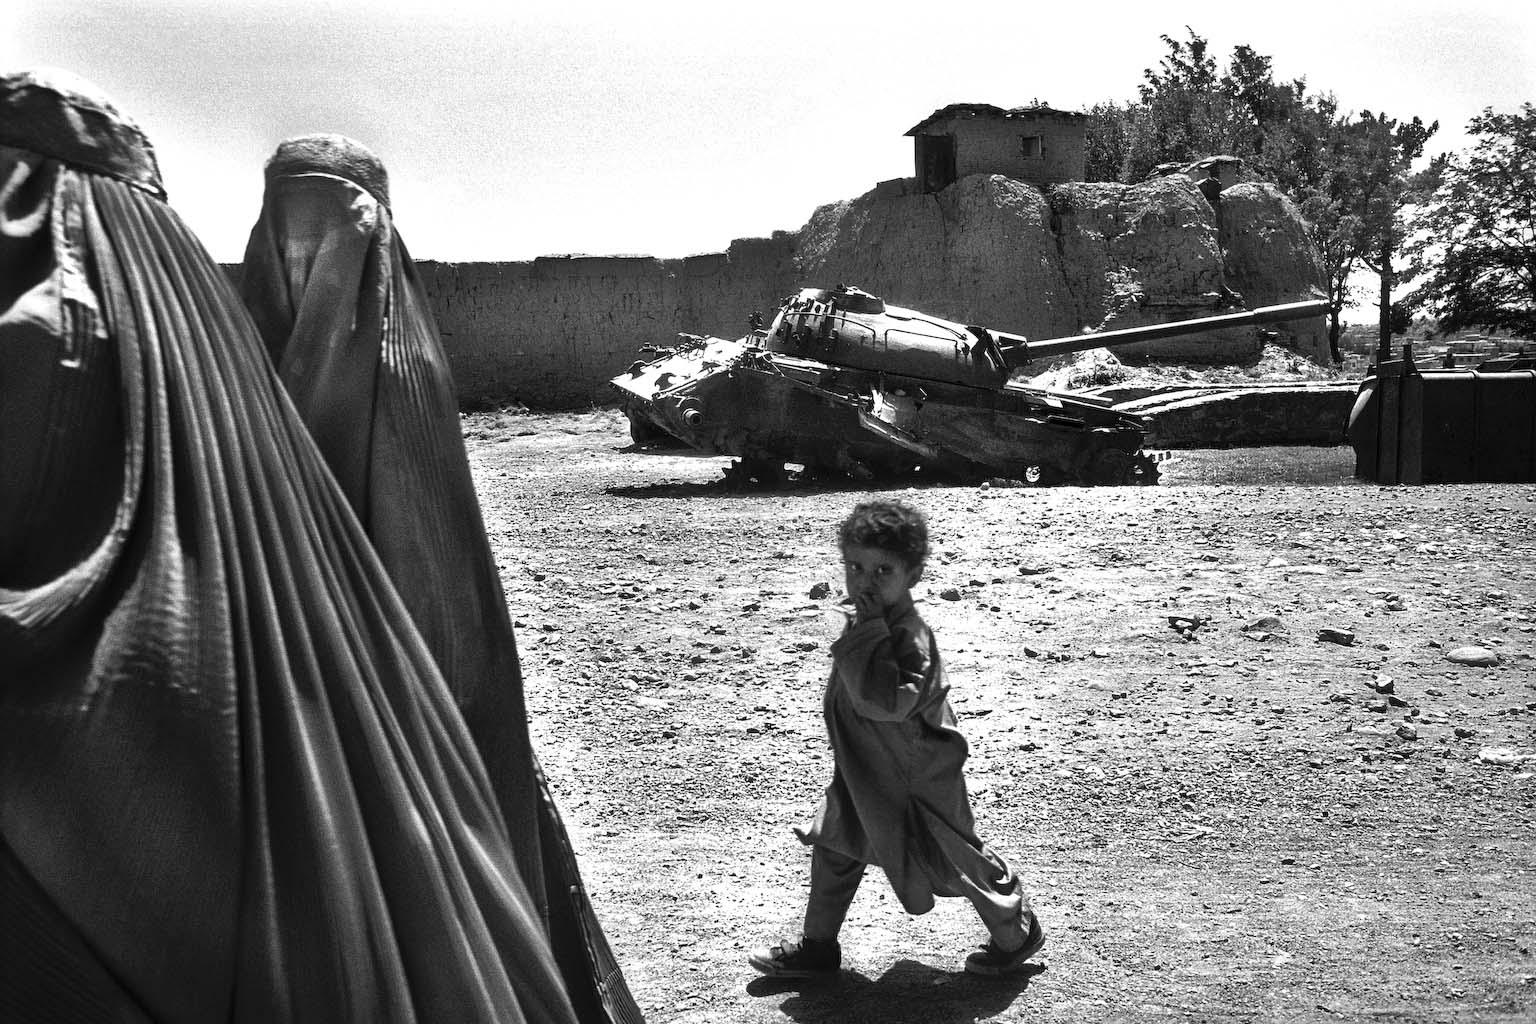 afganistan 006.jpg